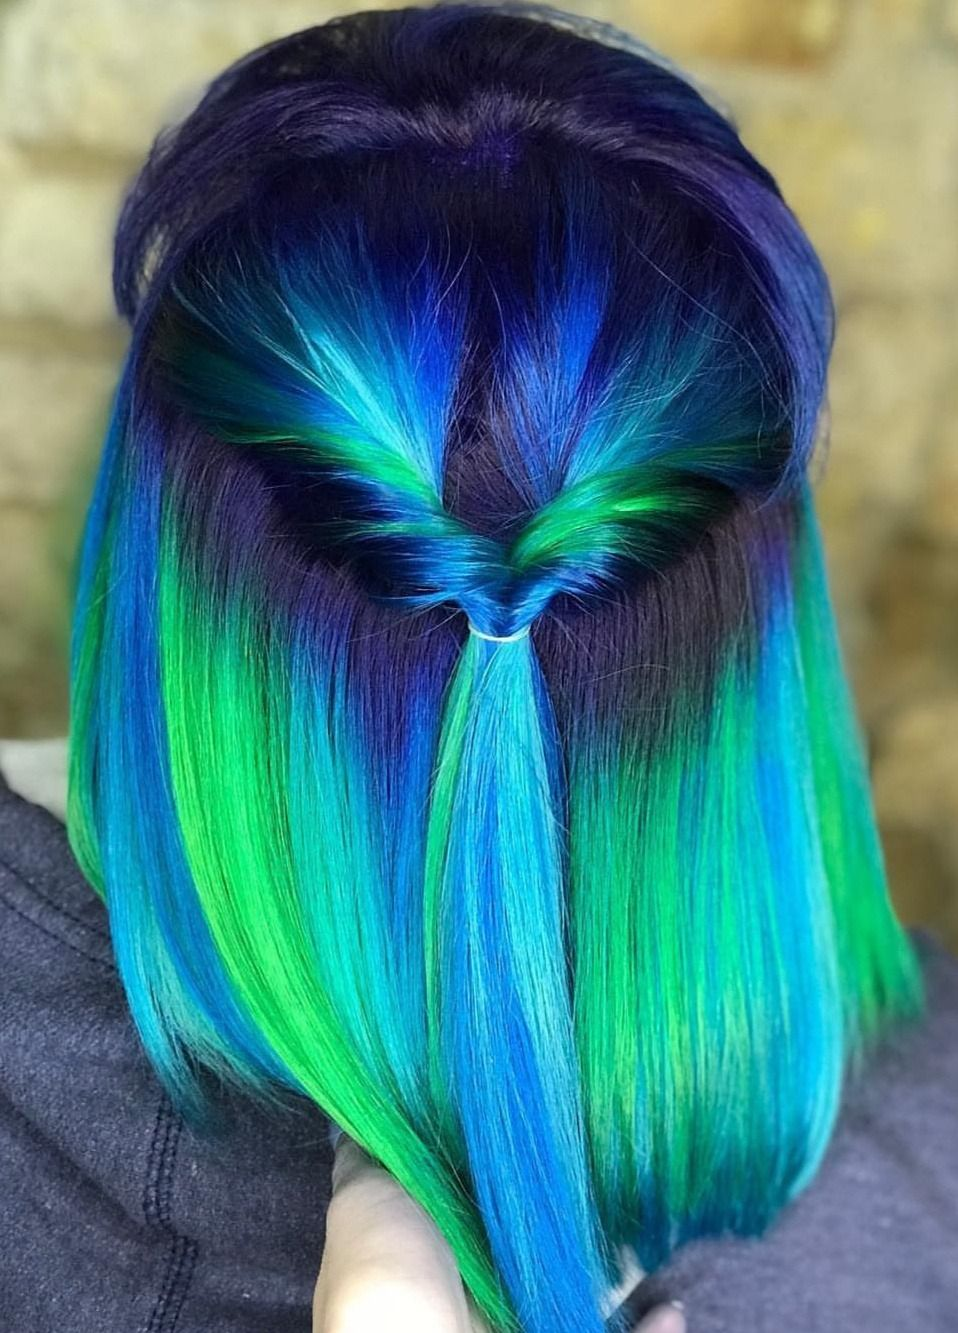 Pin By Elvina Agustino On Hairstyles Rainbow Hair Color Hair Dye Colors Neon Green Hair